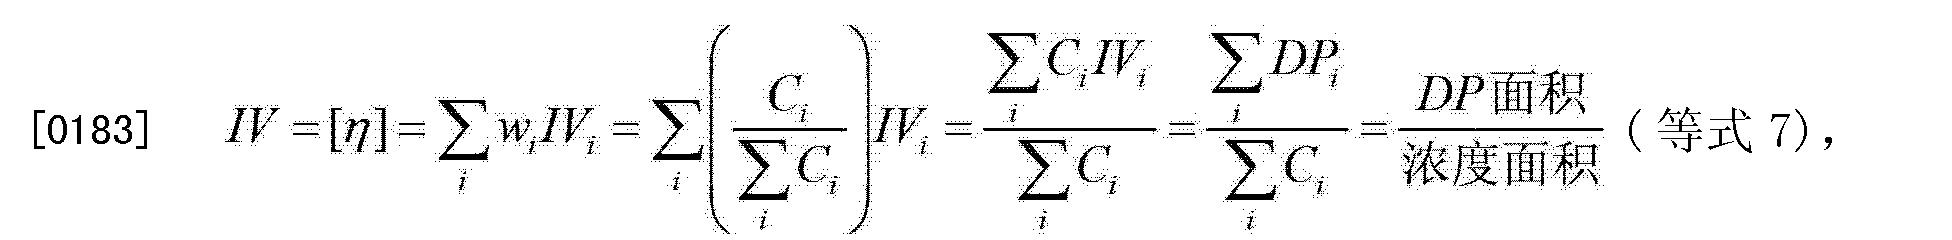 Figure CN102695735AD00222